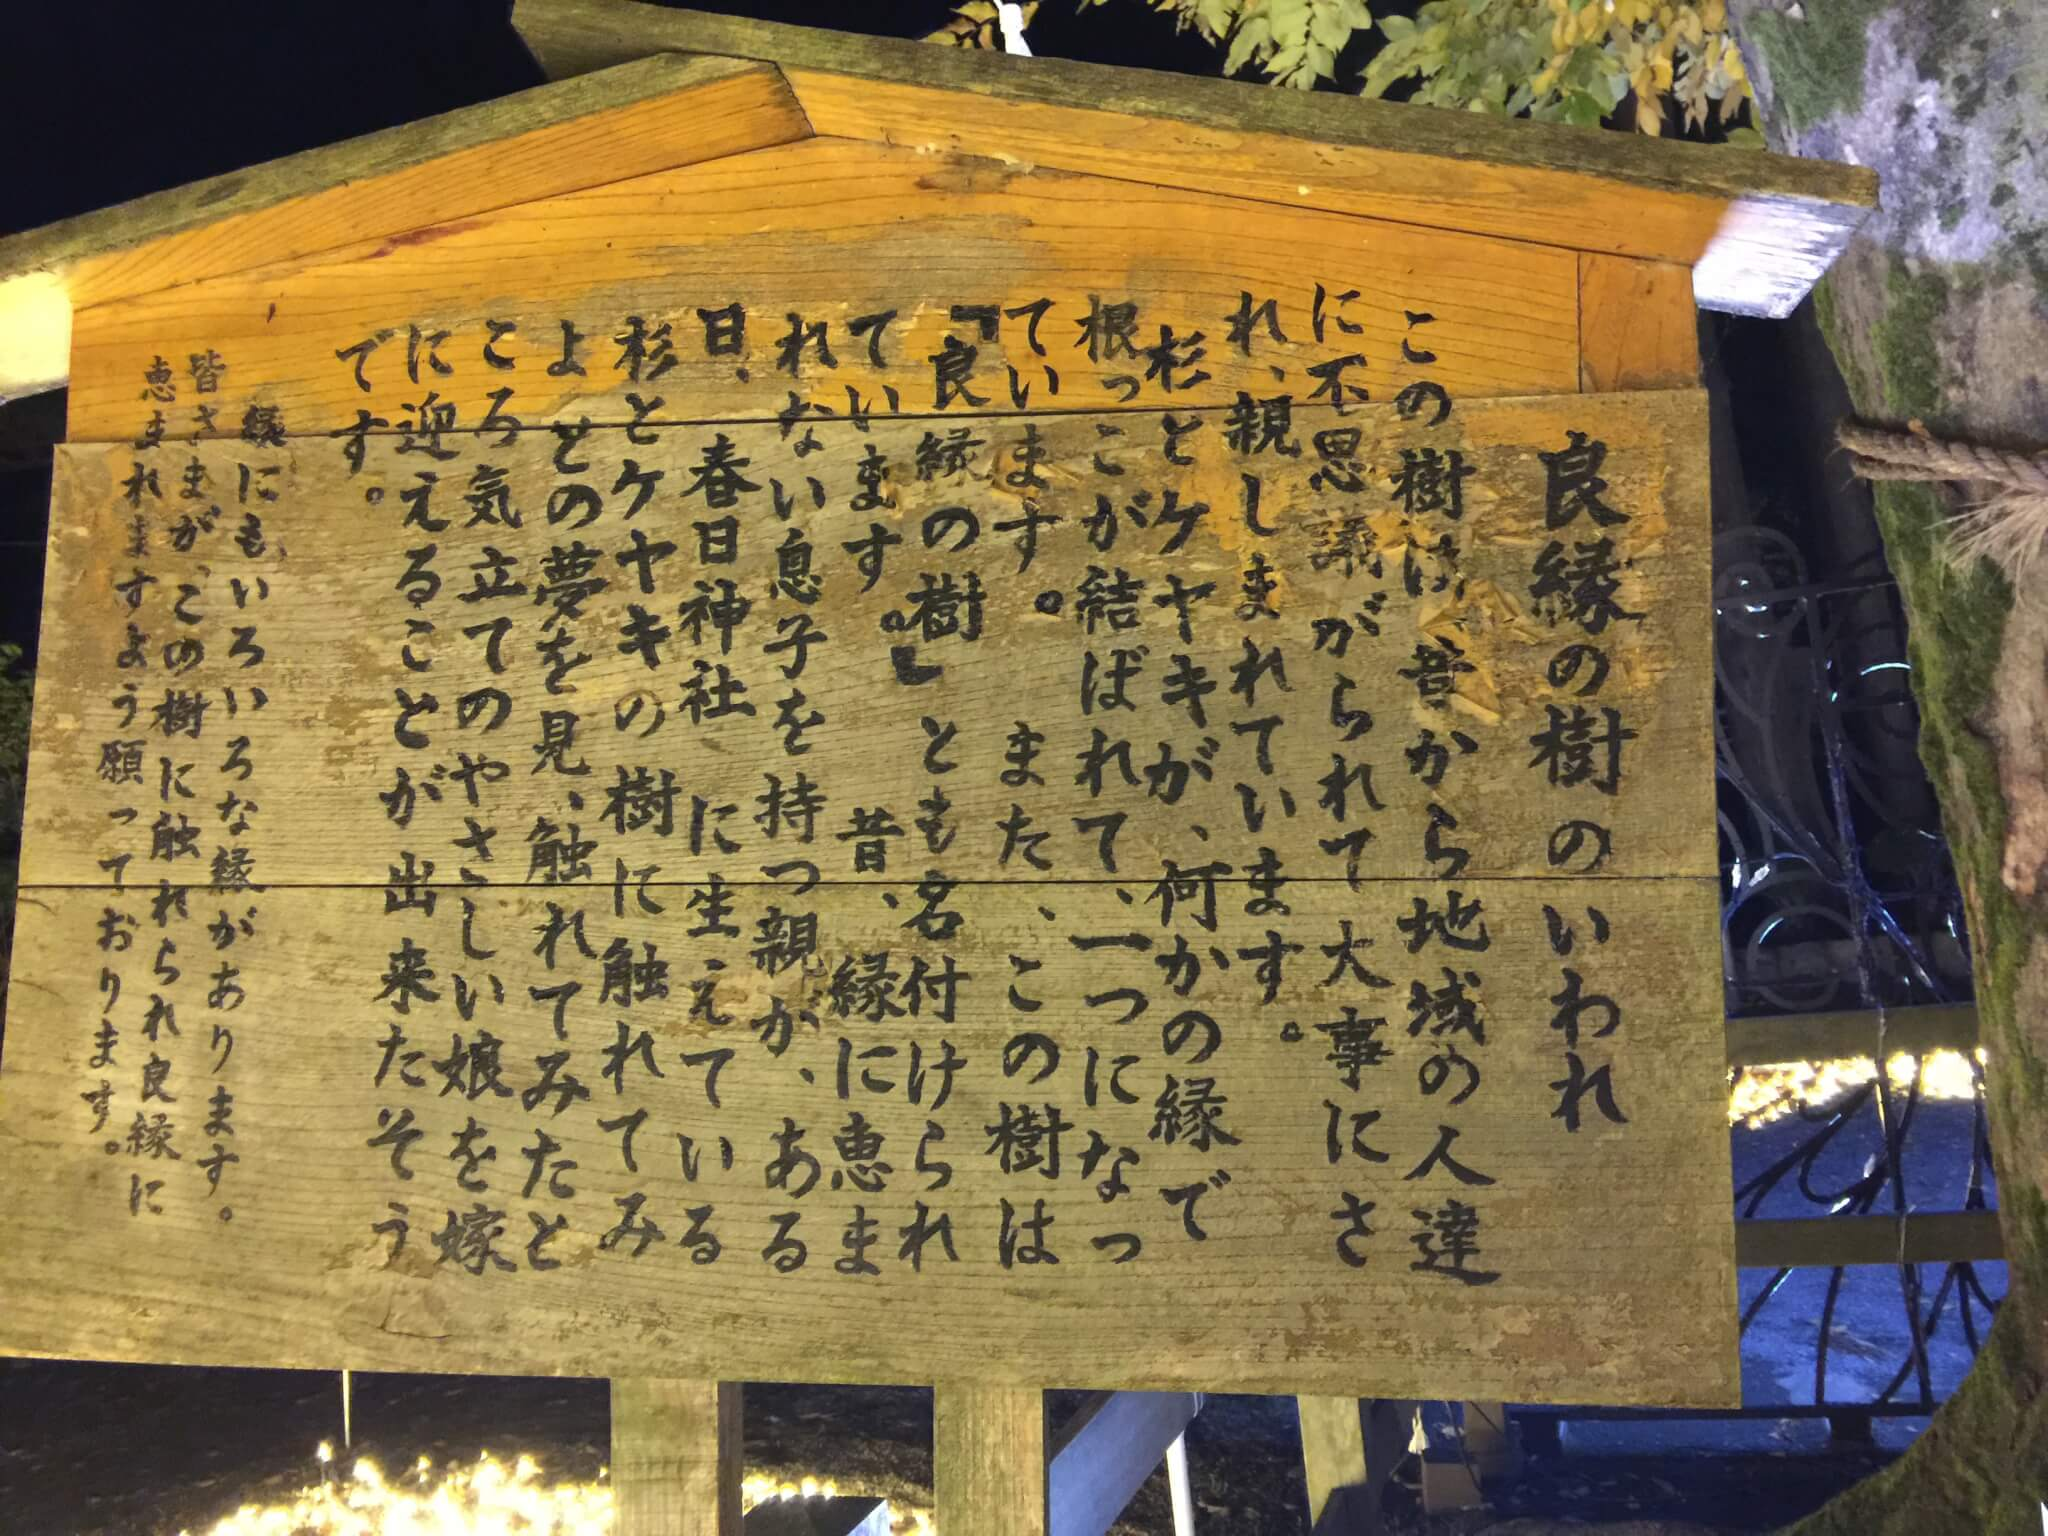 Arrown的・福井県大野市のおすすめ観光ルートをご紹介!